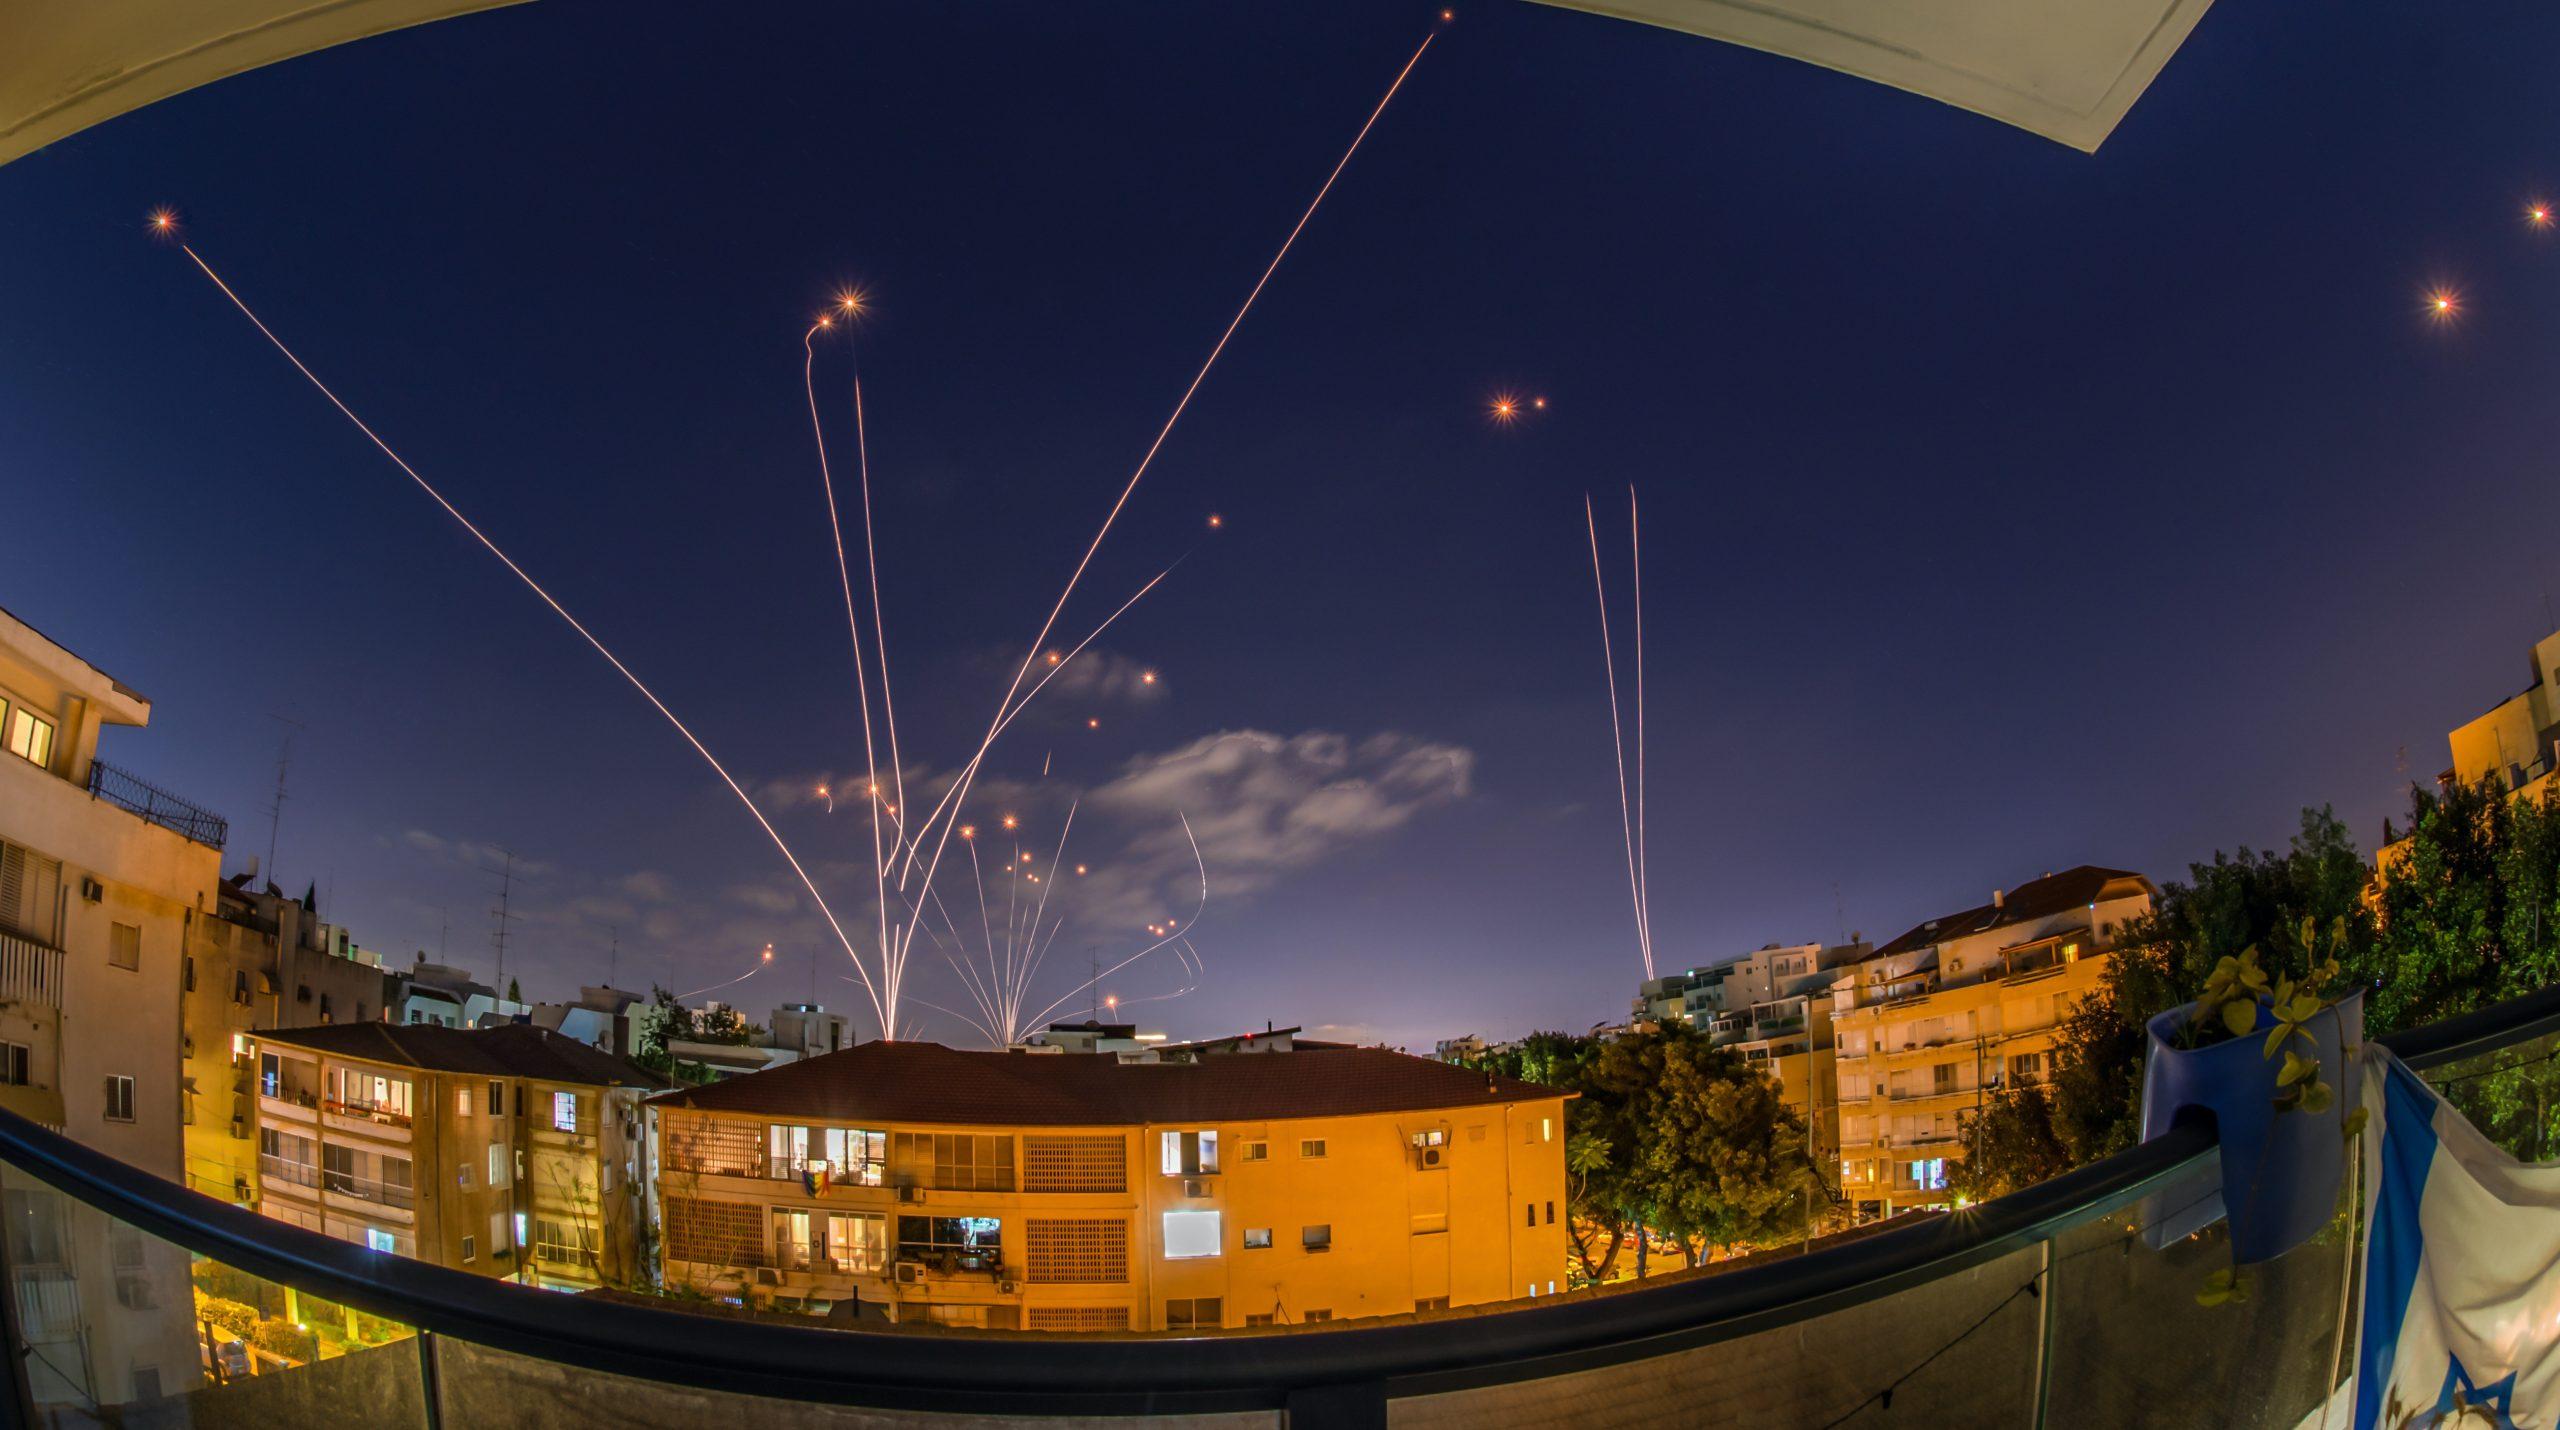 Iron,Dome,Rocket,Interceptions,Of,Hamas,Rockets-,Southern,Israel-,Night